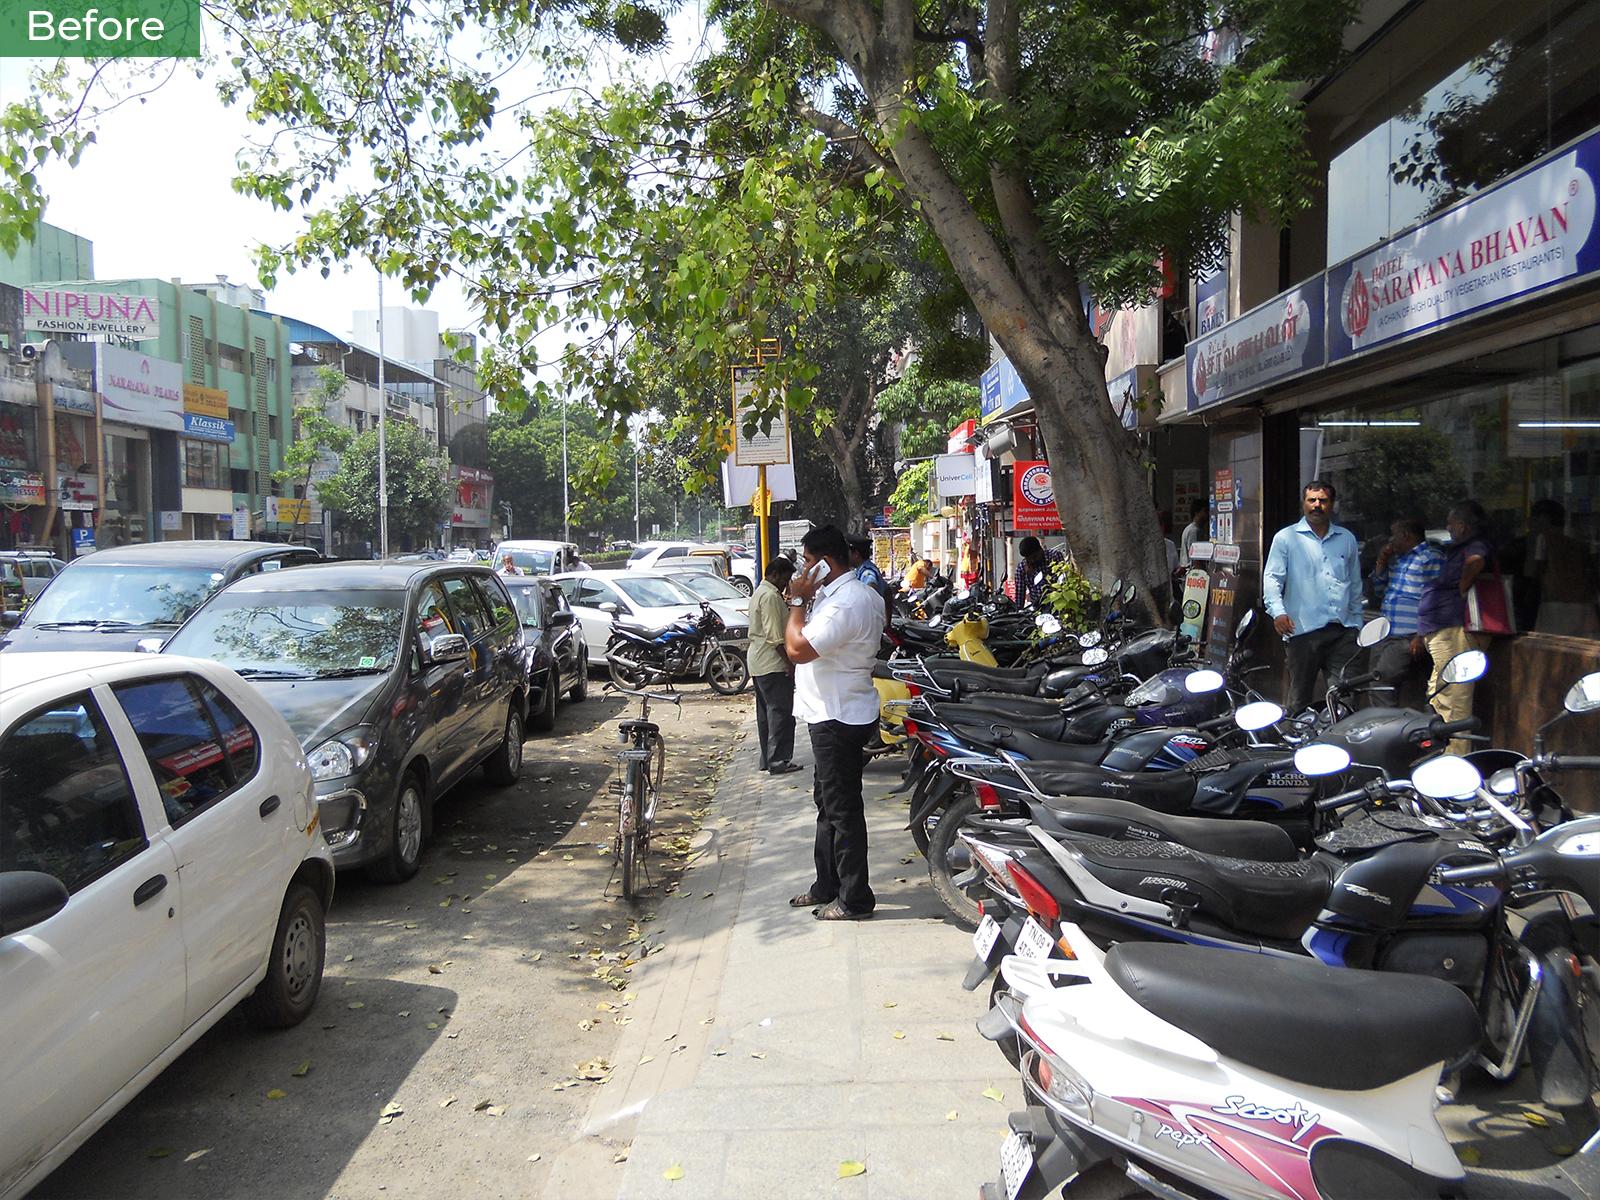 Before-The Pondy Bazaar Pedestrian Plaza